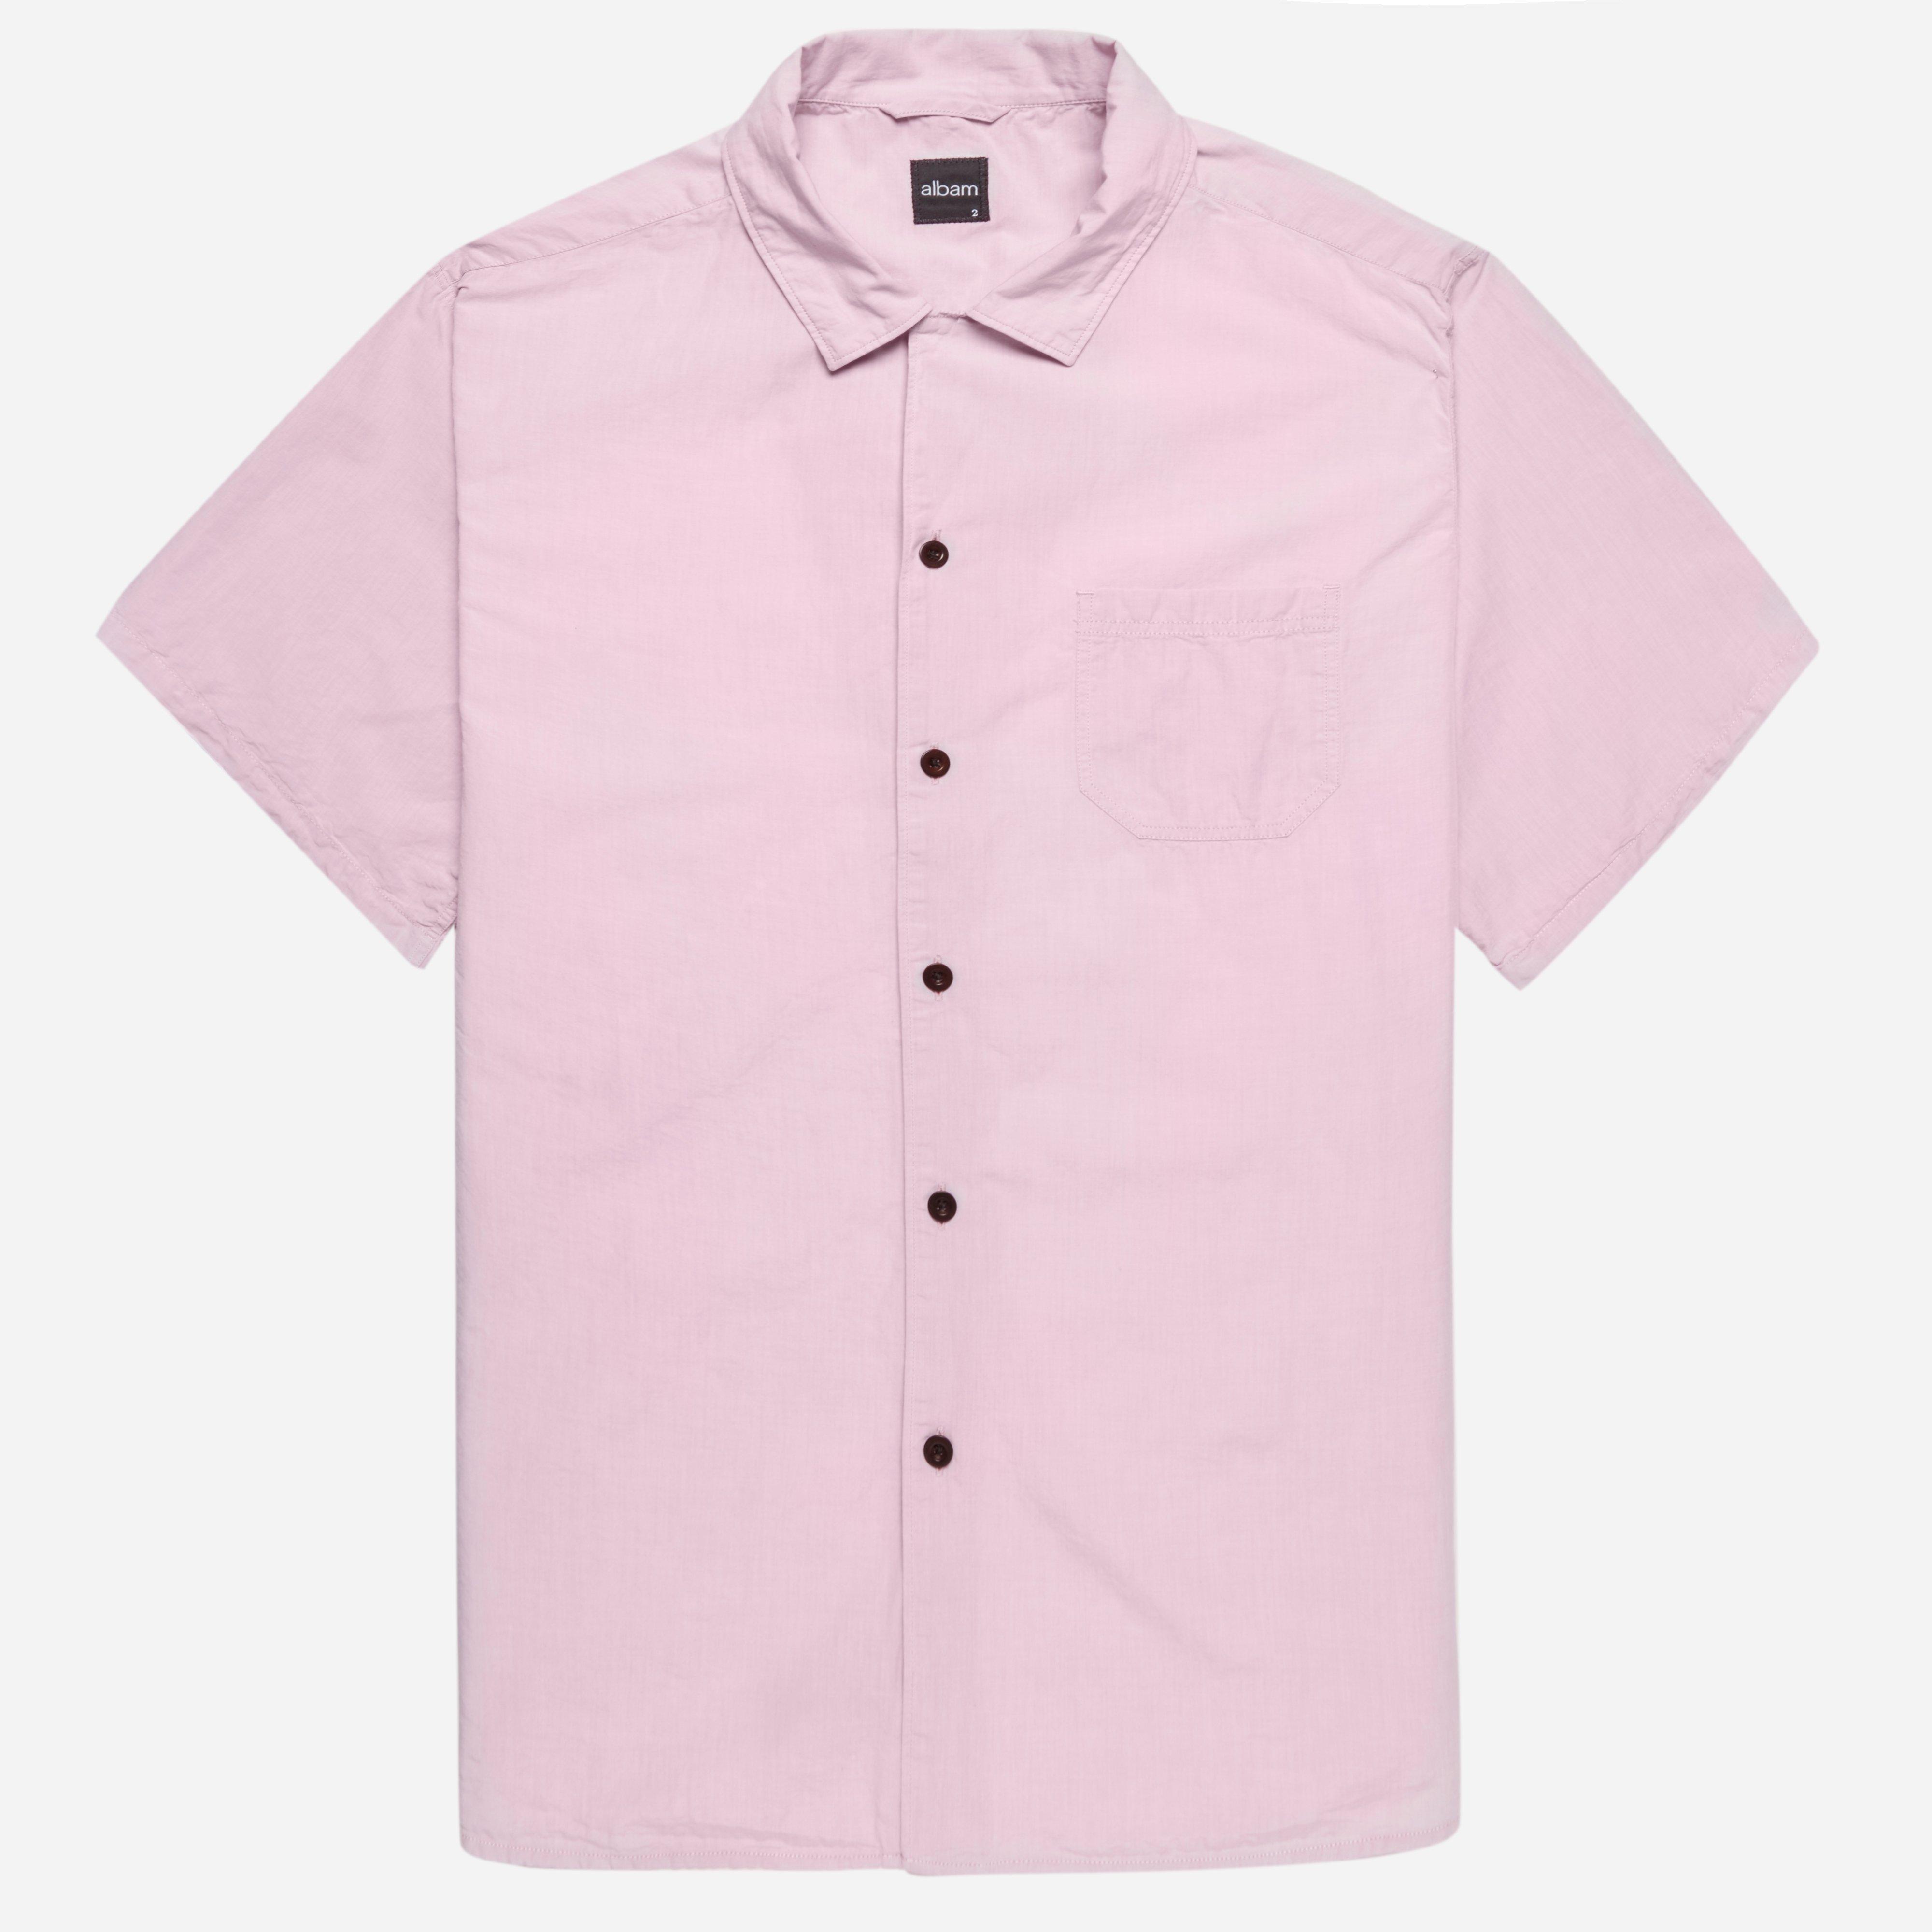 Albam Panama Shirt